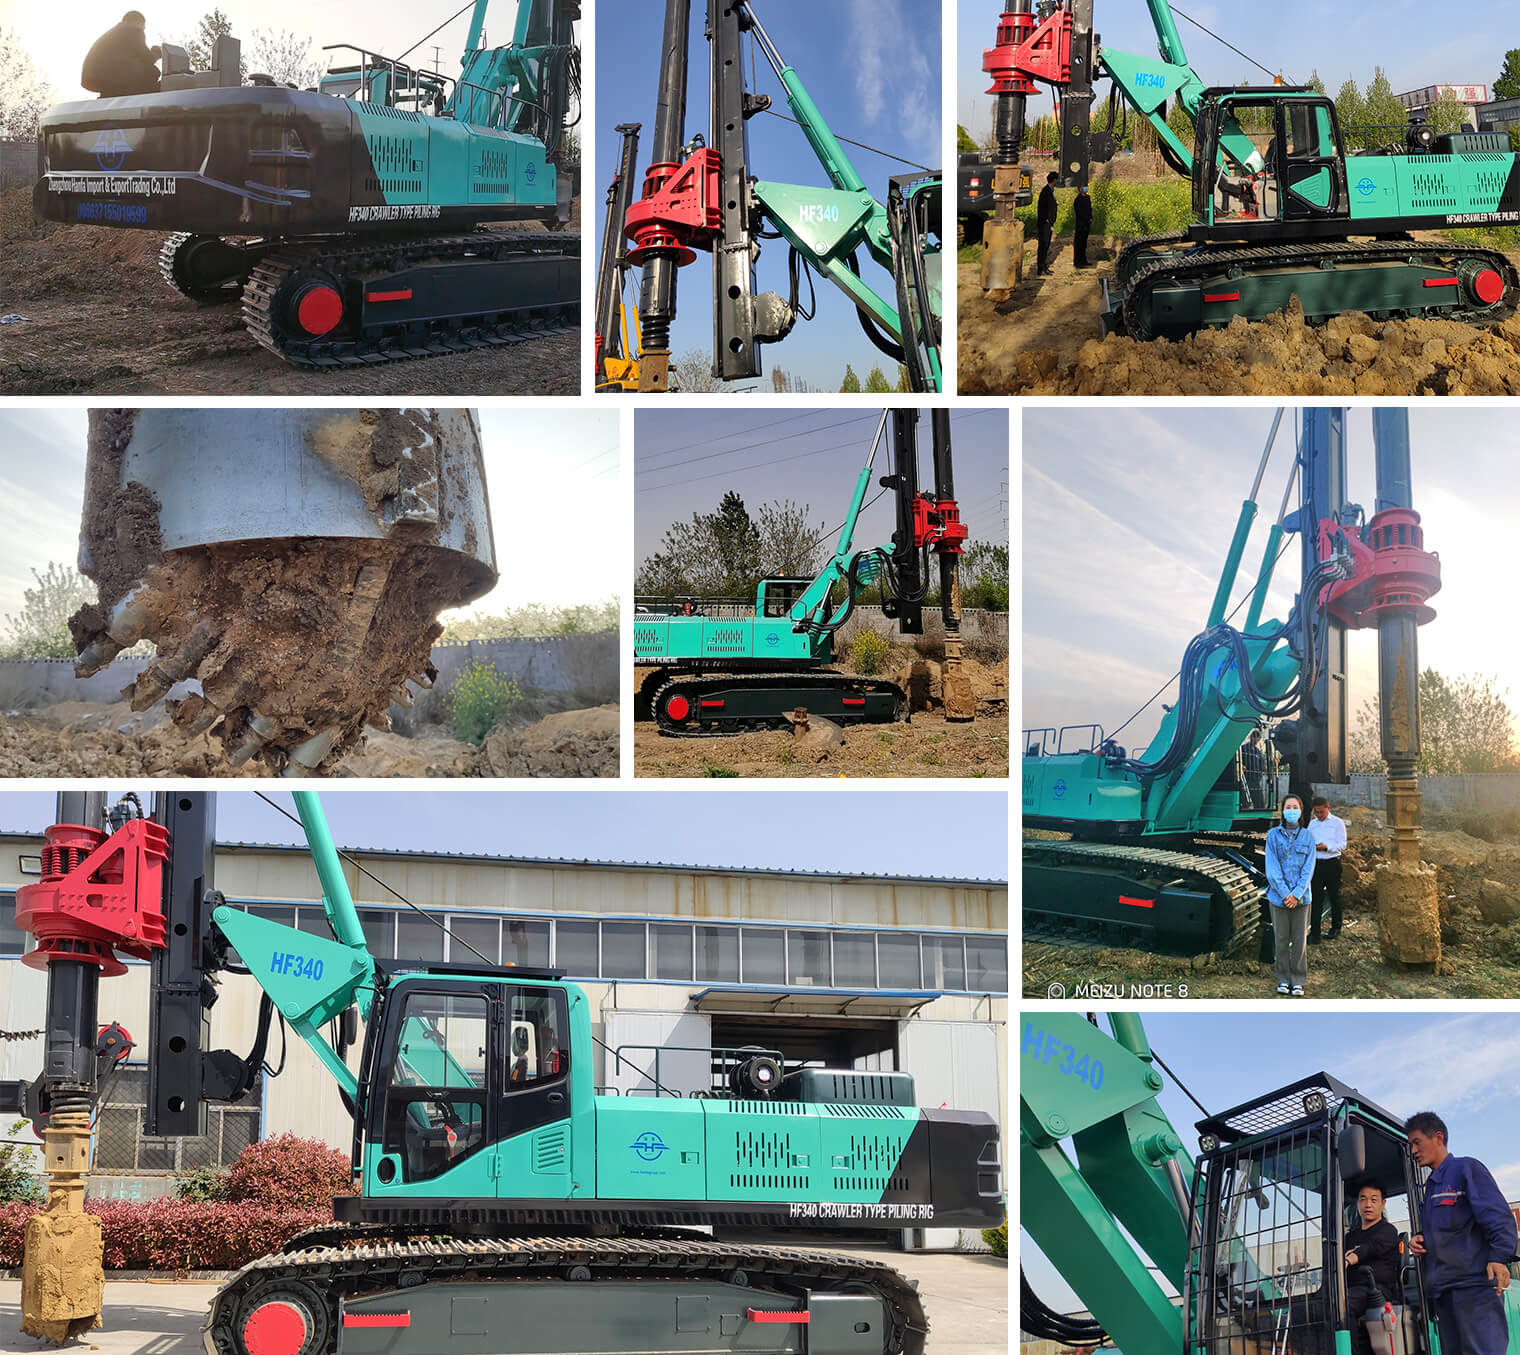 HF340 rotary piling rig